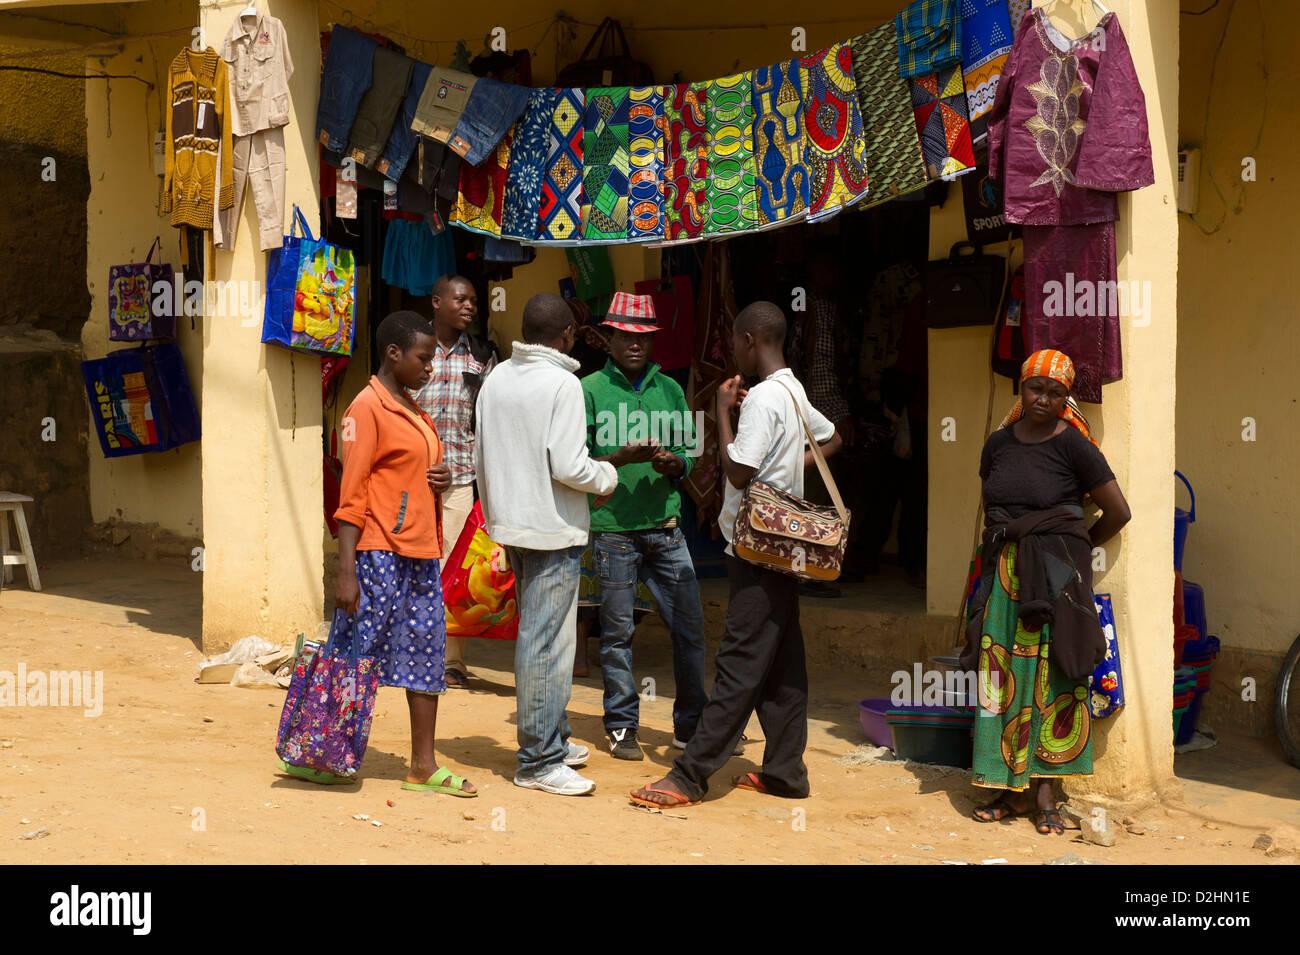 Shop, Ngororero, Rwanda - Stock Image